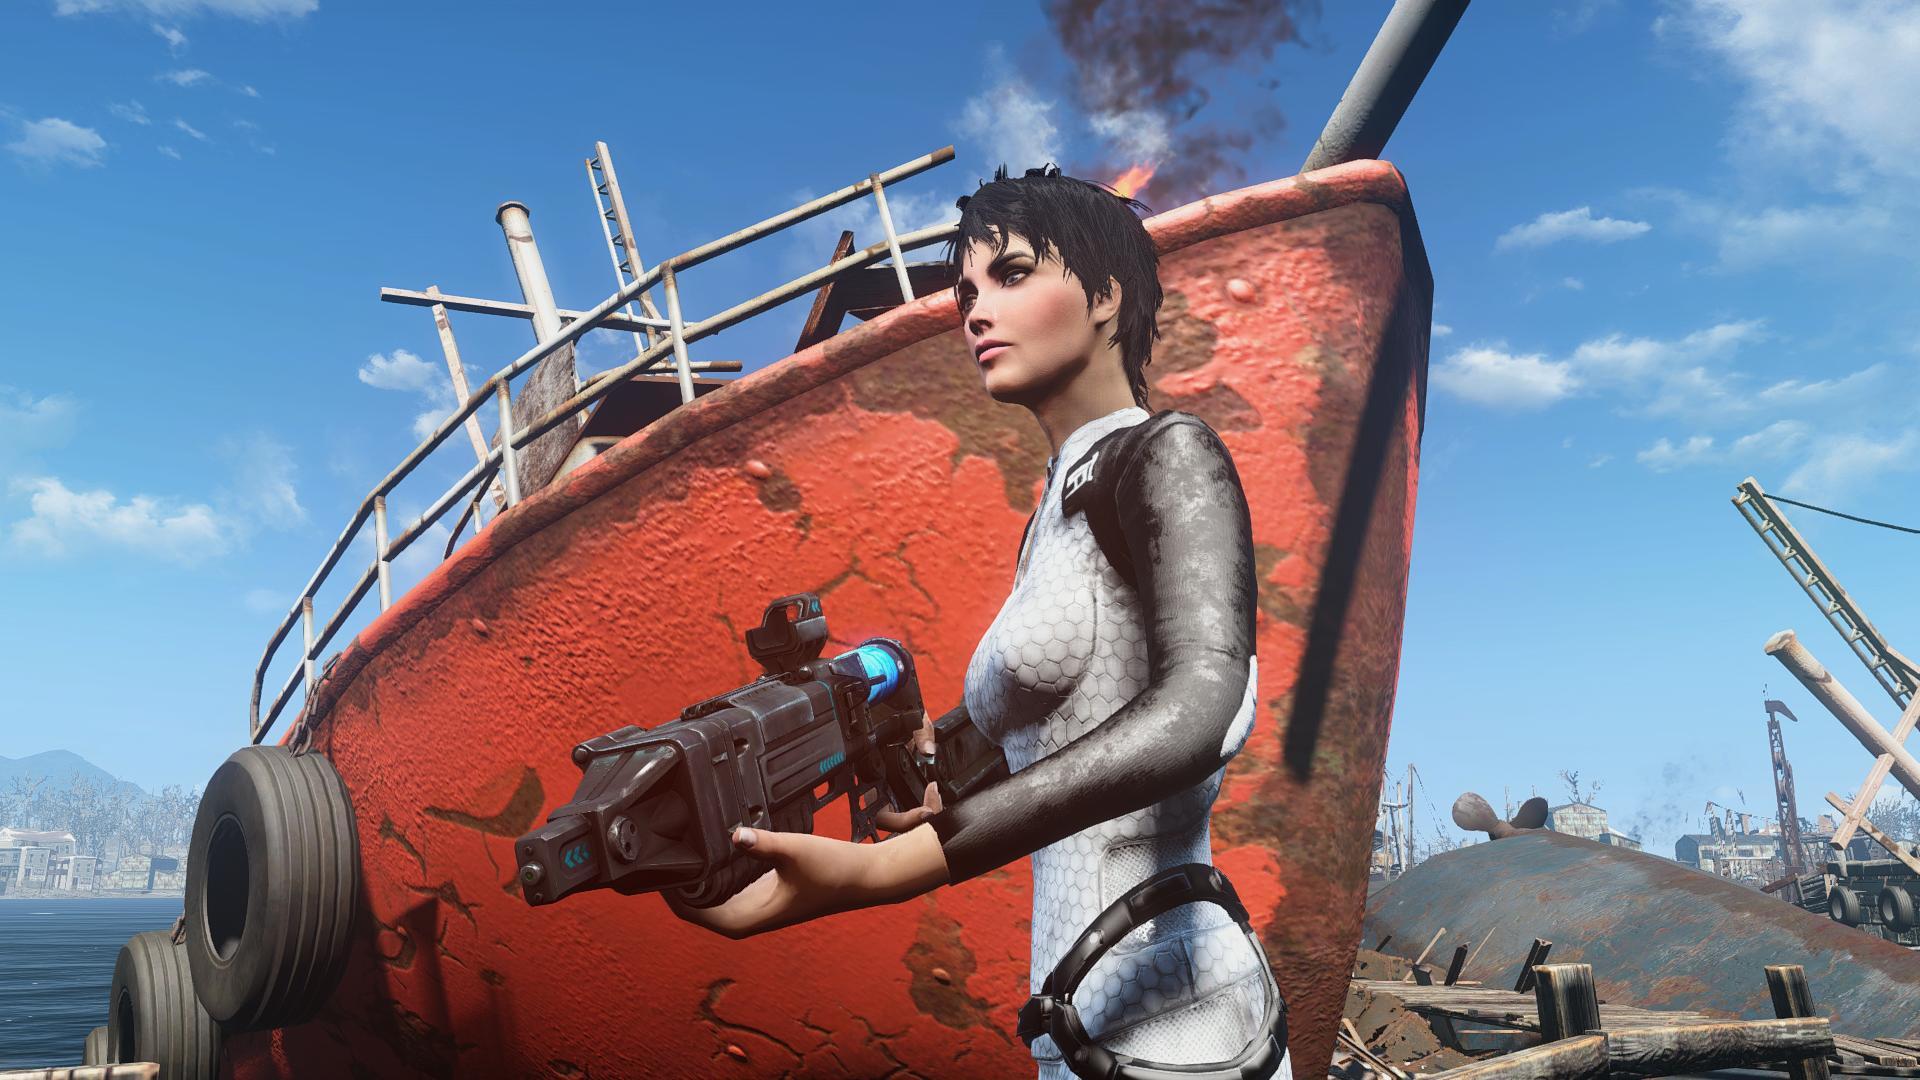 000504.Jpg - Fallout 4